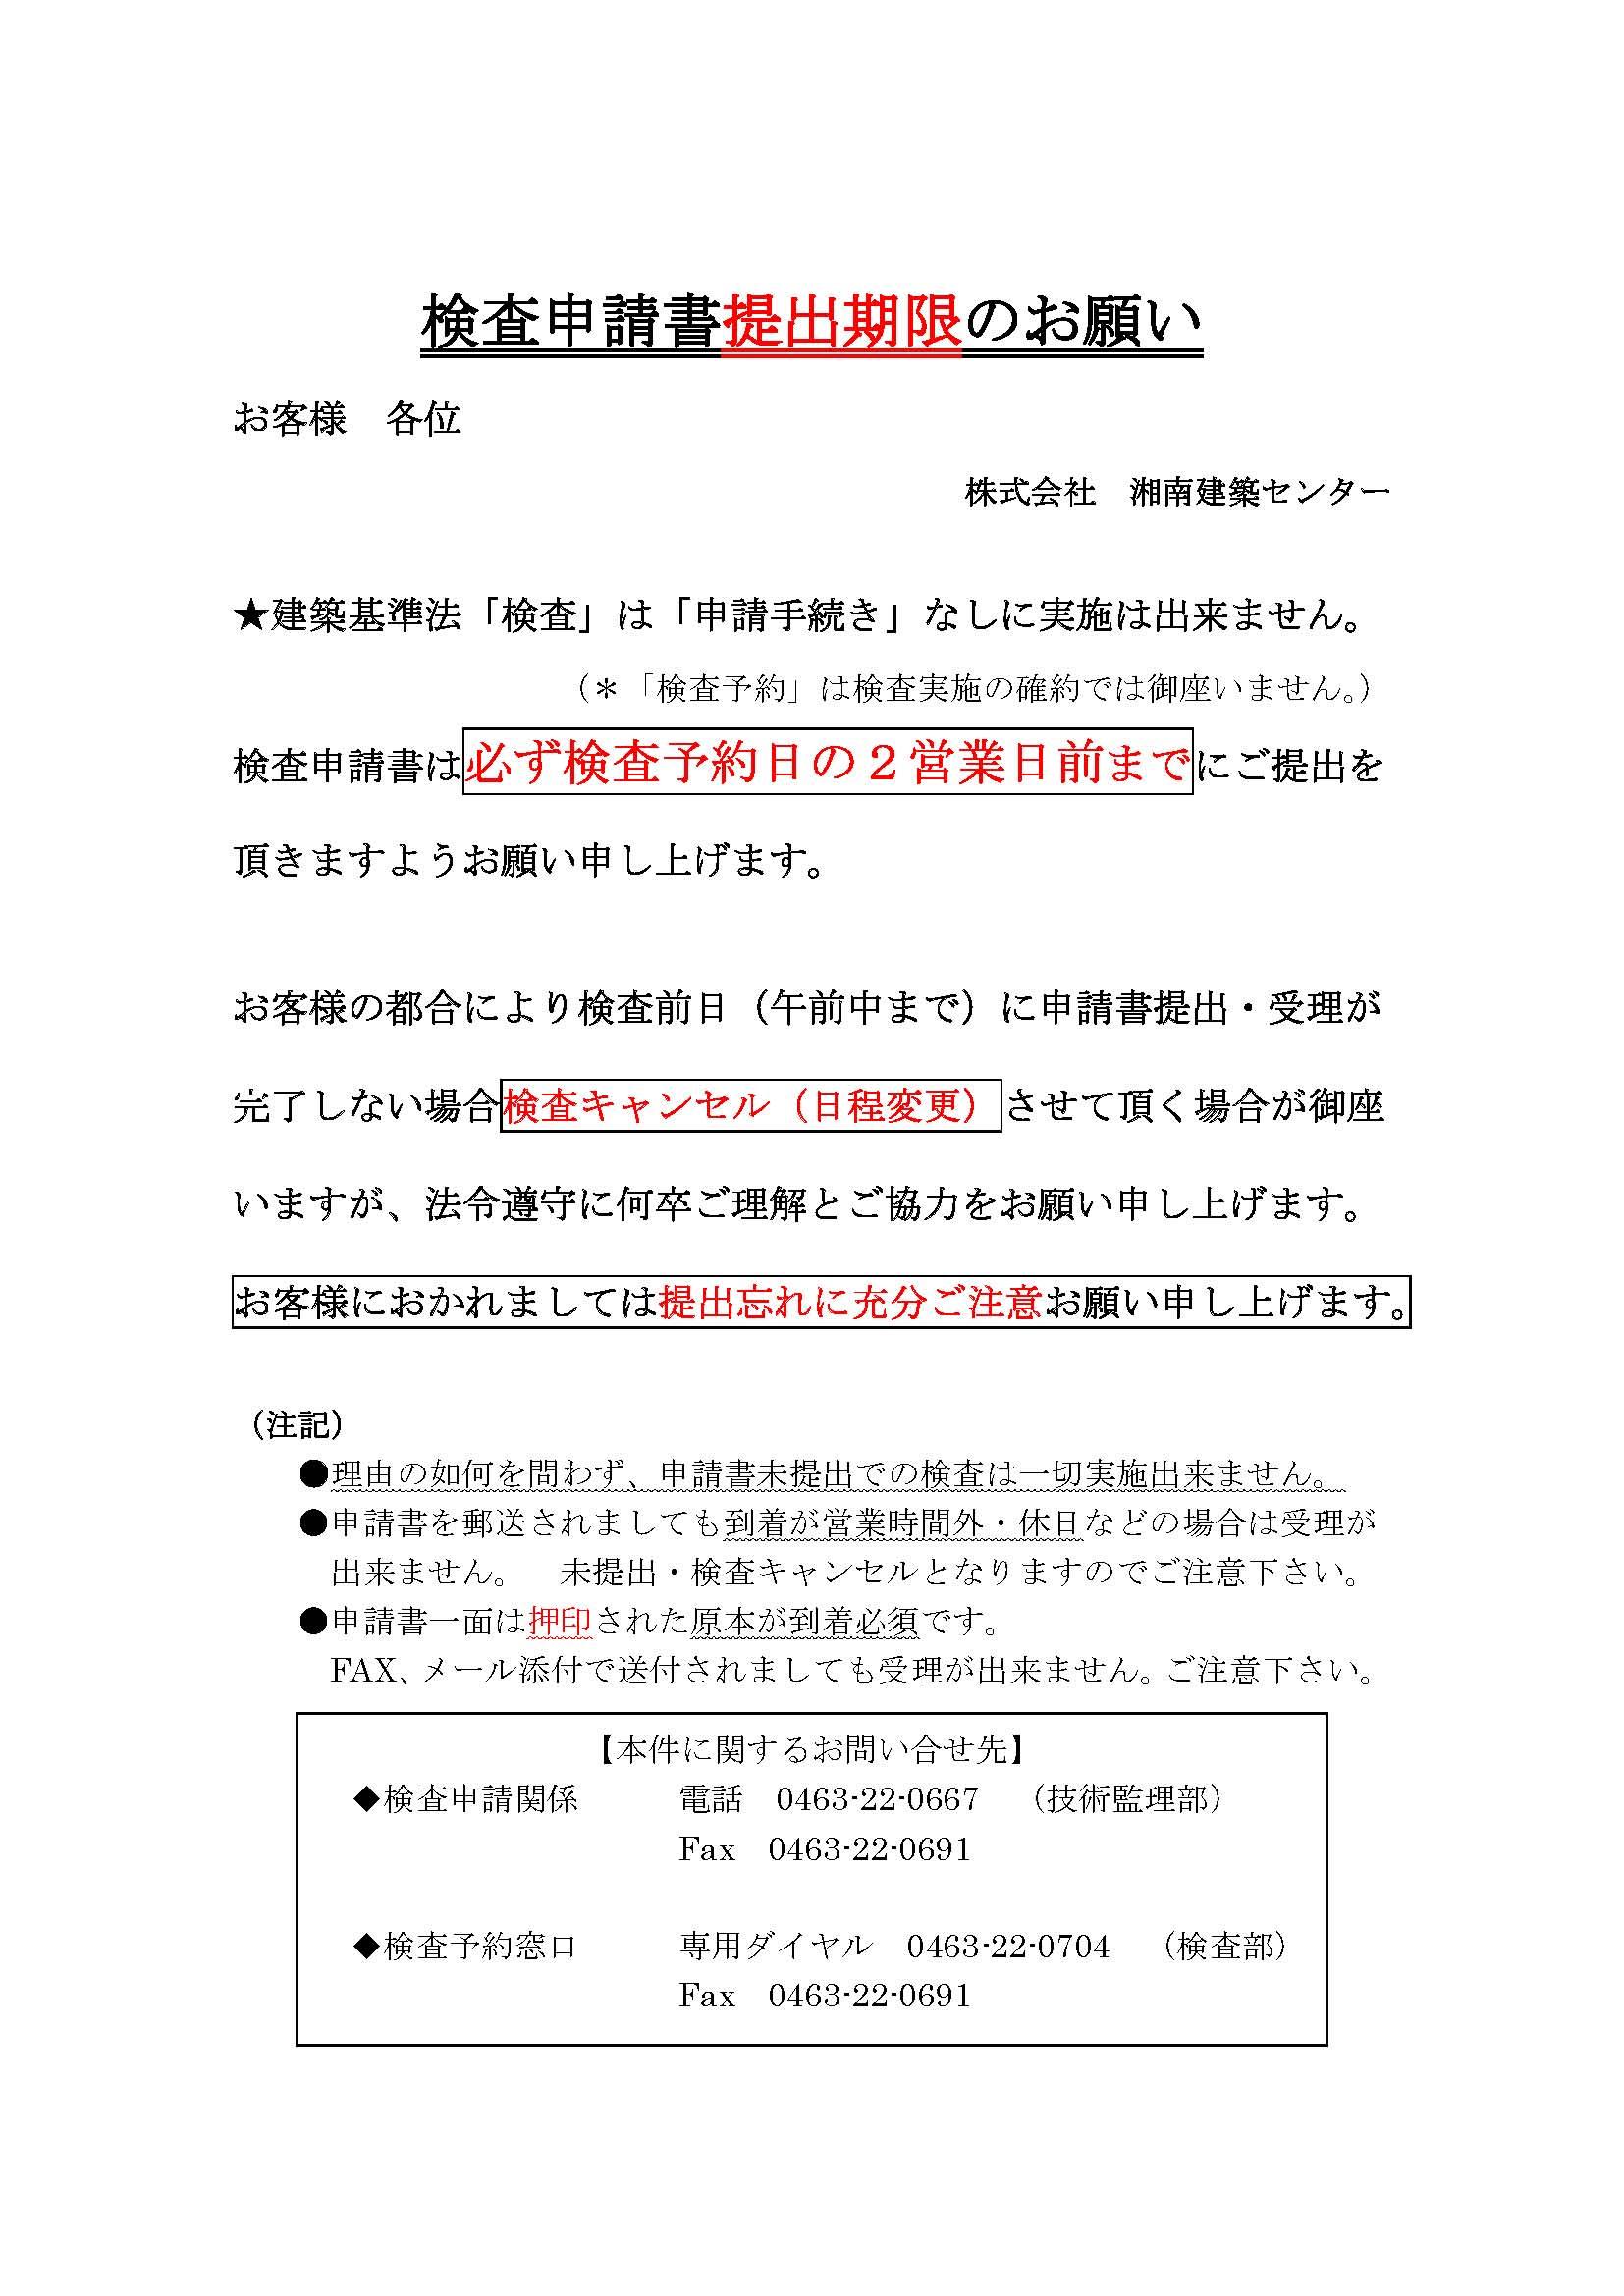 SBC 株式会社 湘南建築センターWEBサイト //トピックス詳細//